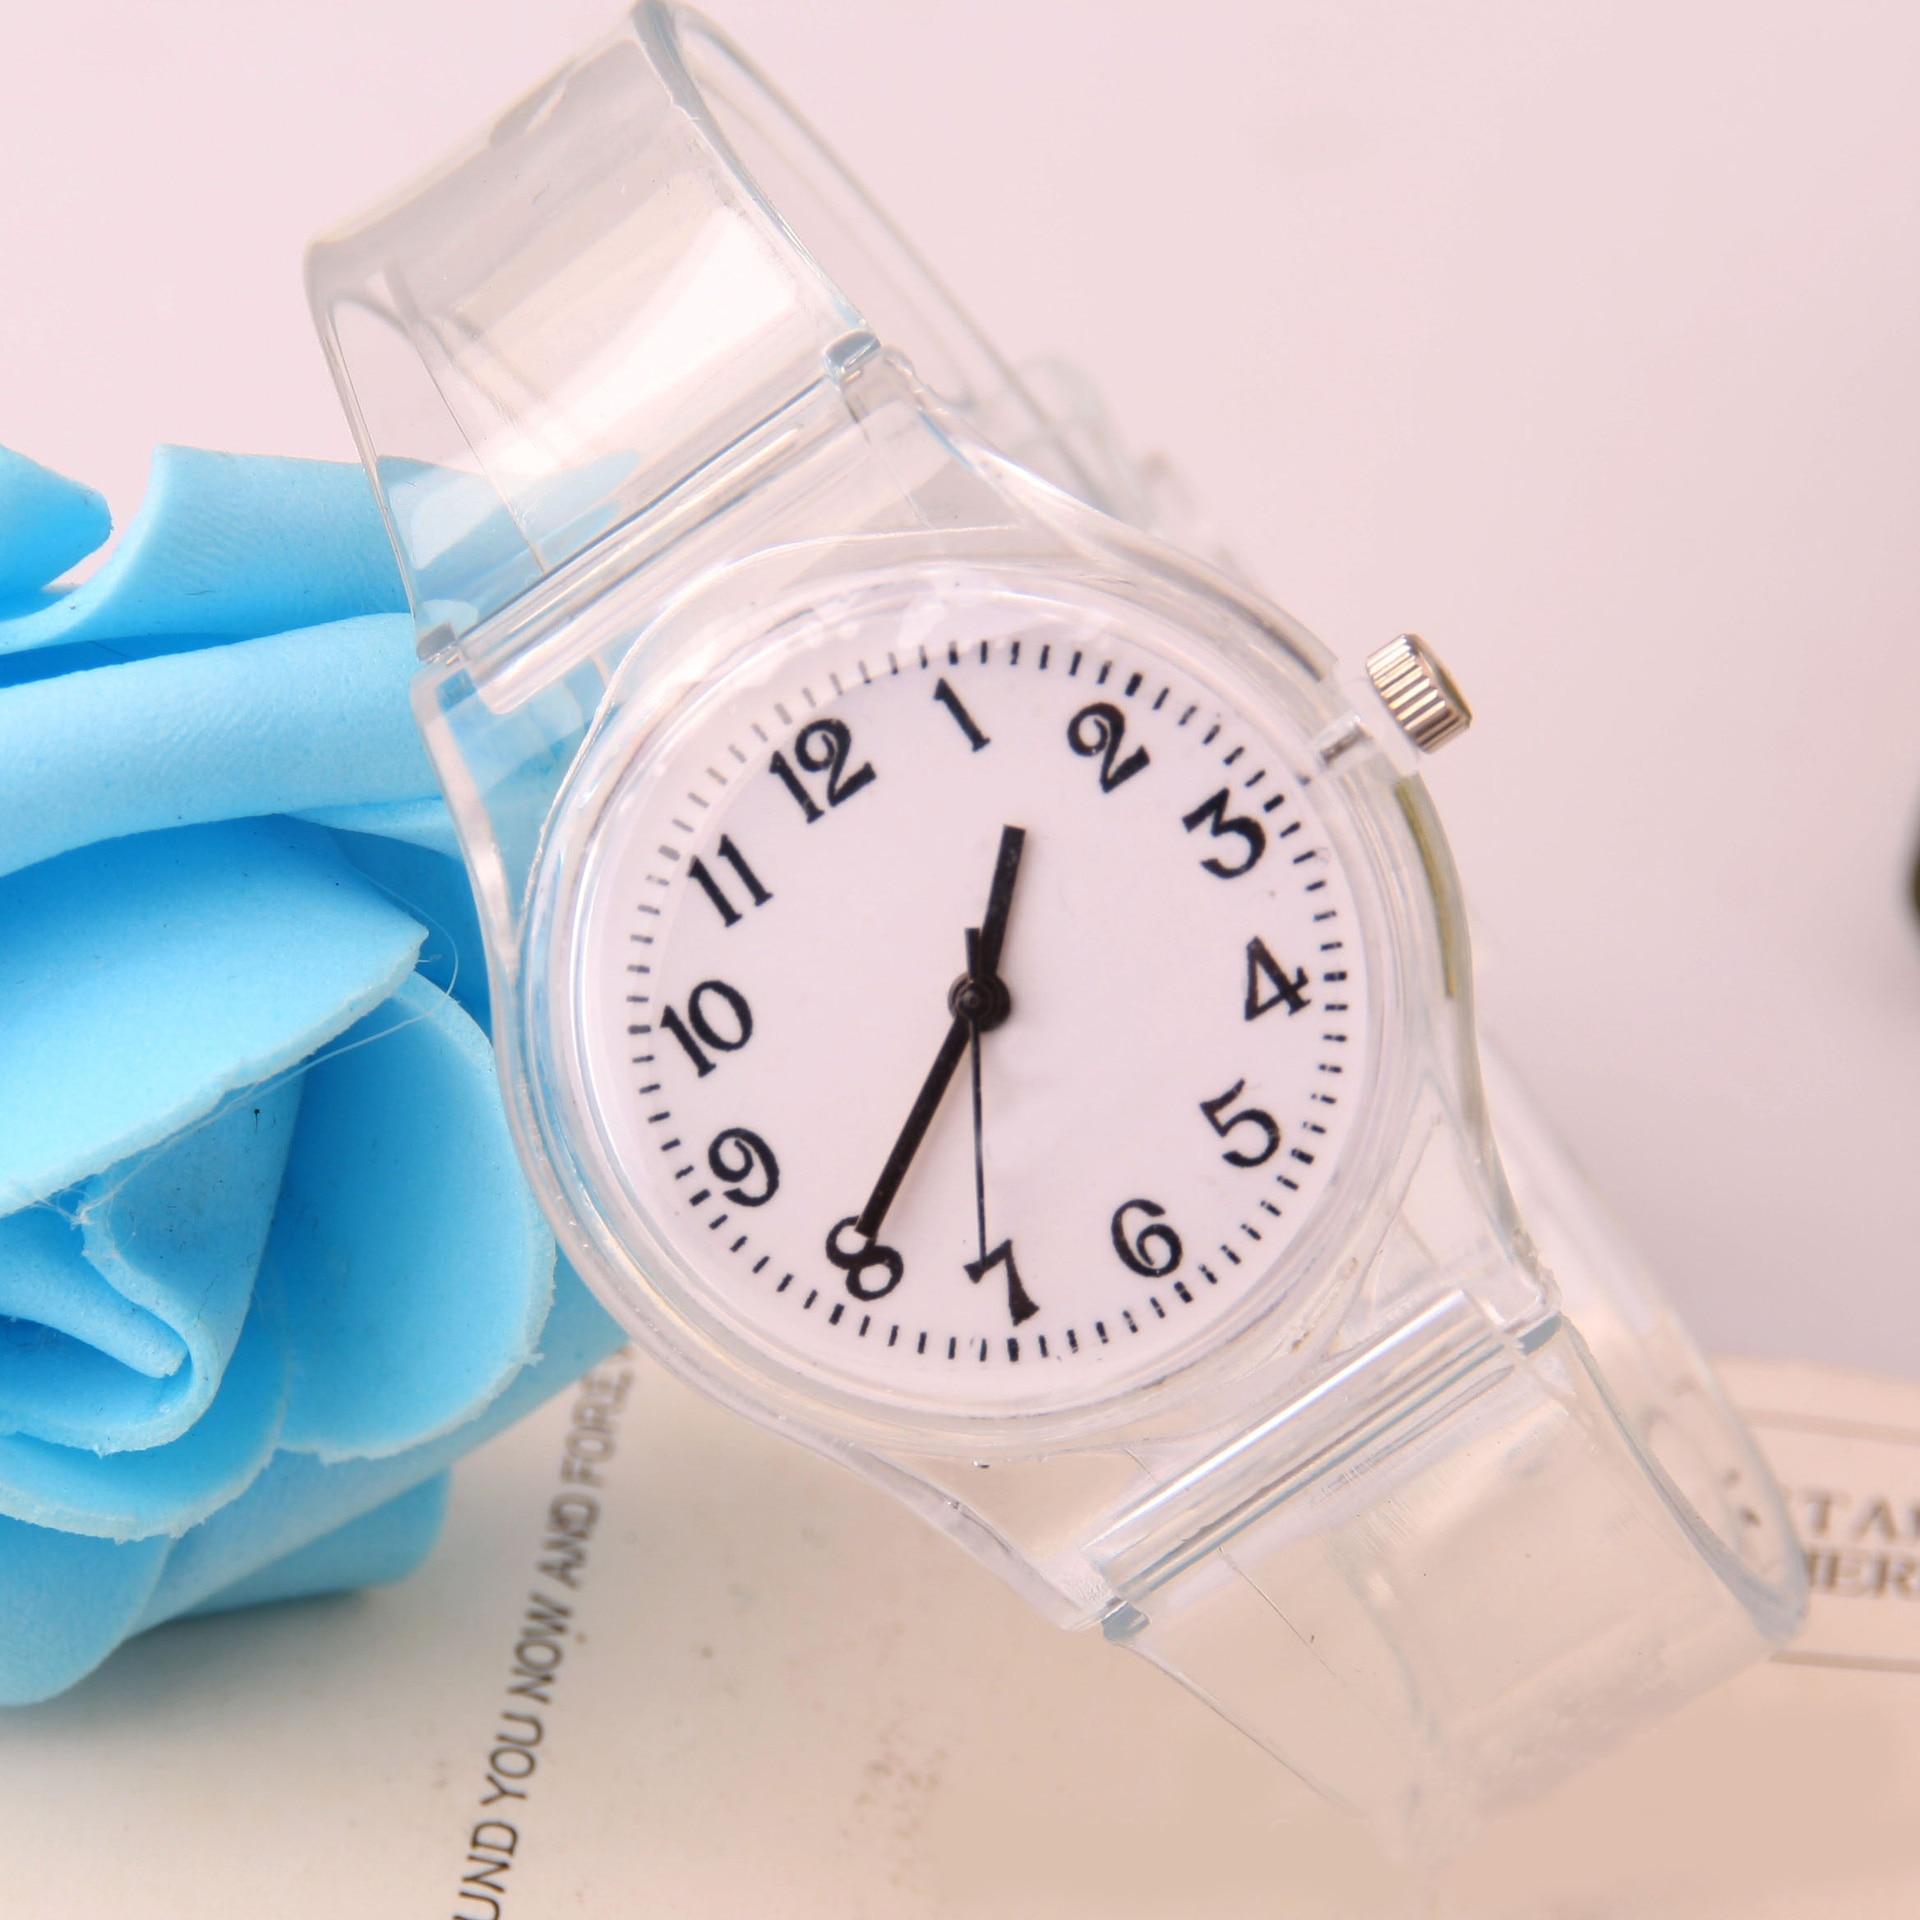 women's-watches-transparent-silicone-jelly-wristwatch-sport-casual-quartz-wristwatches-cartoon-ladies-dress-watches-men's-clock